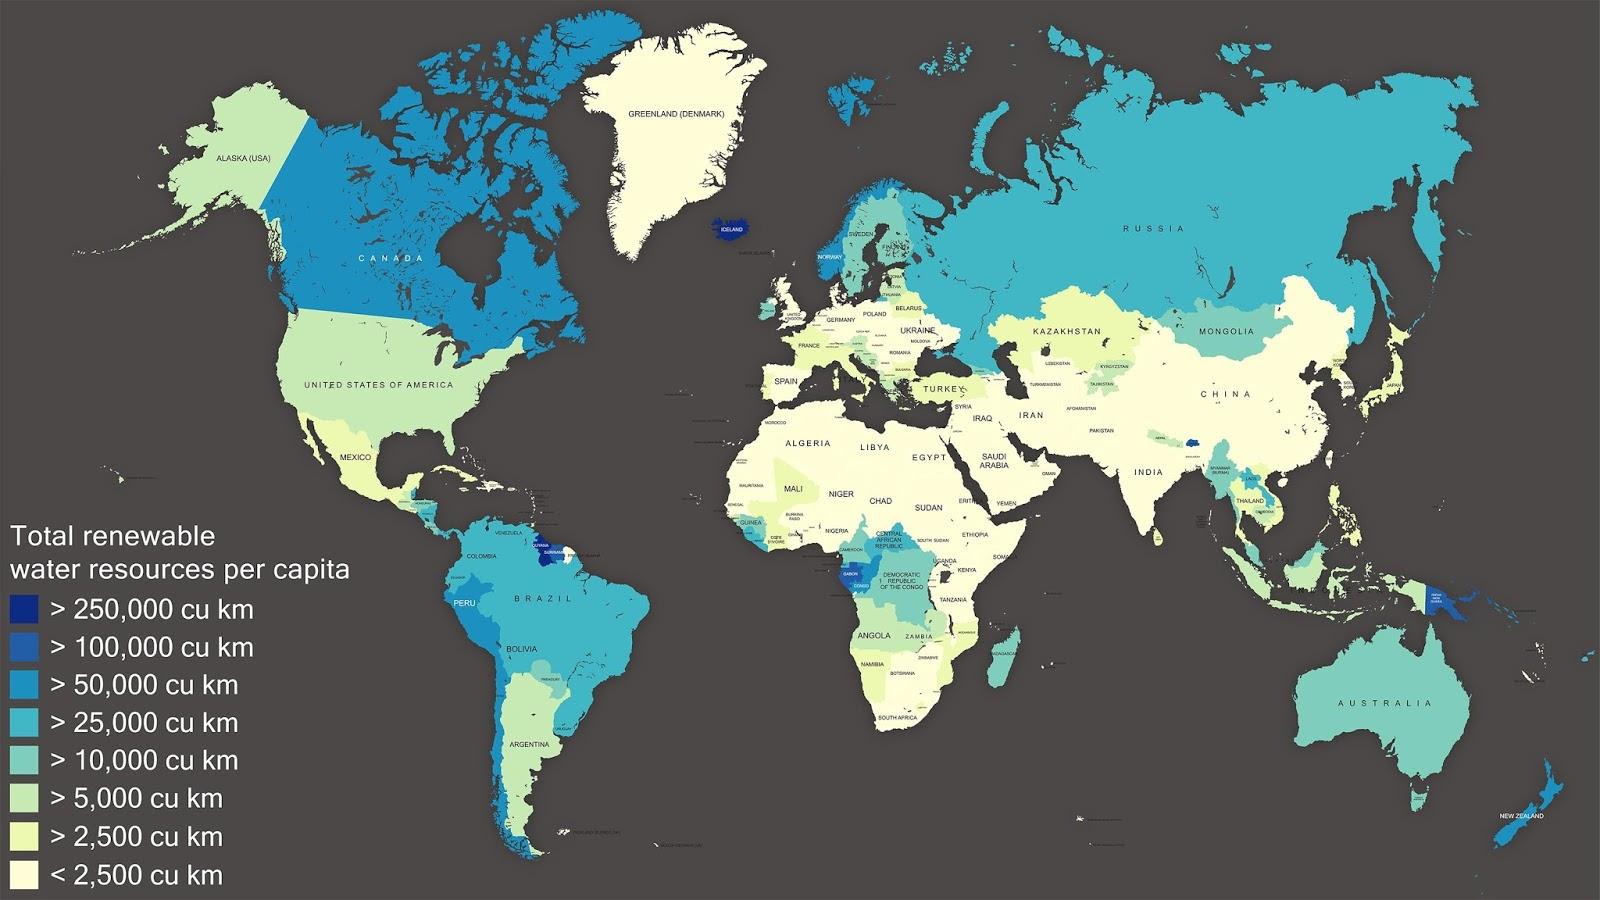 Renewable water resources per capita